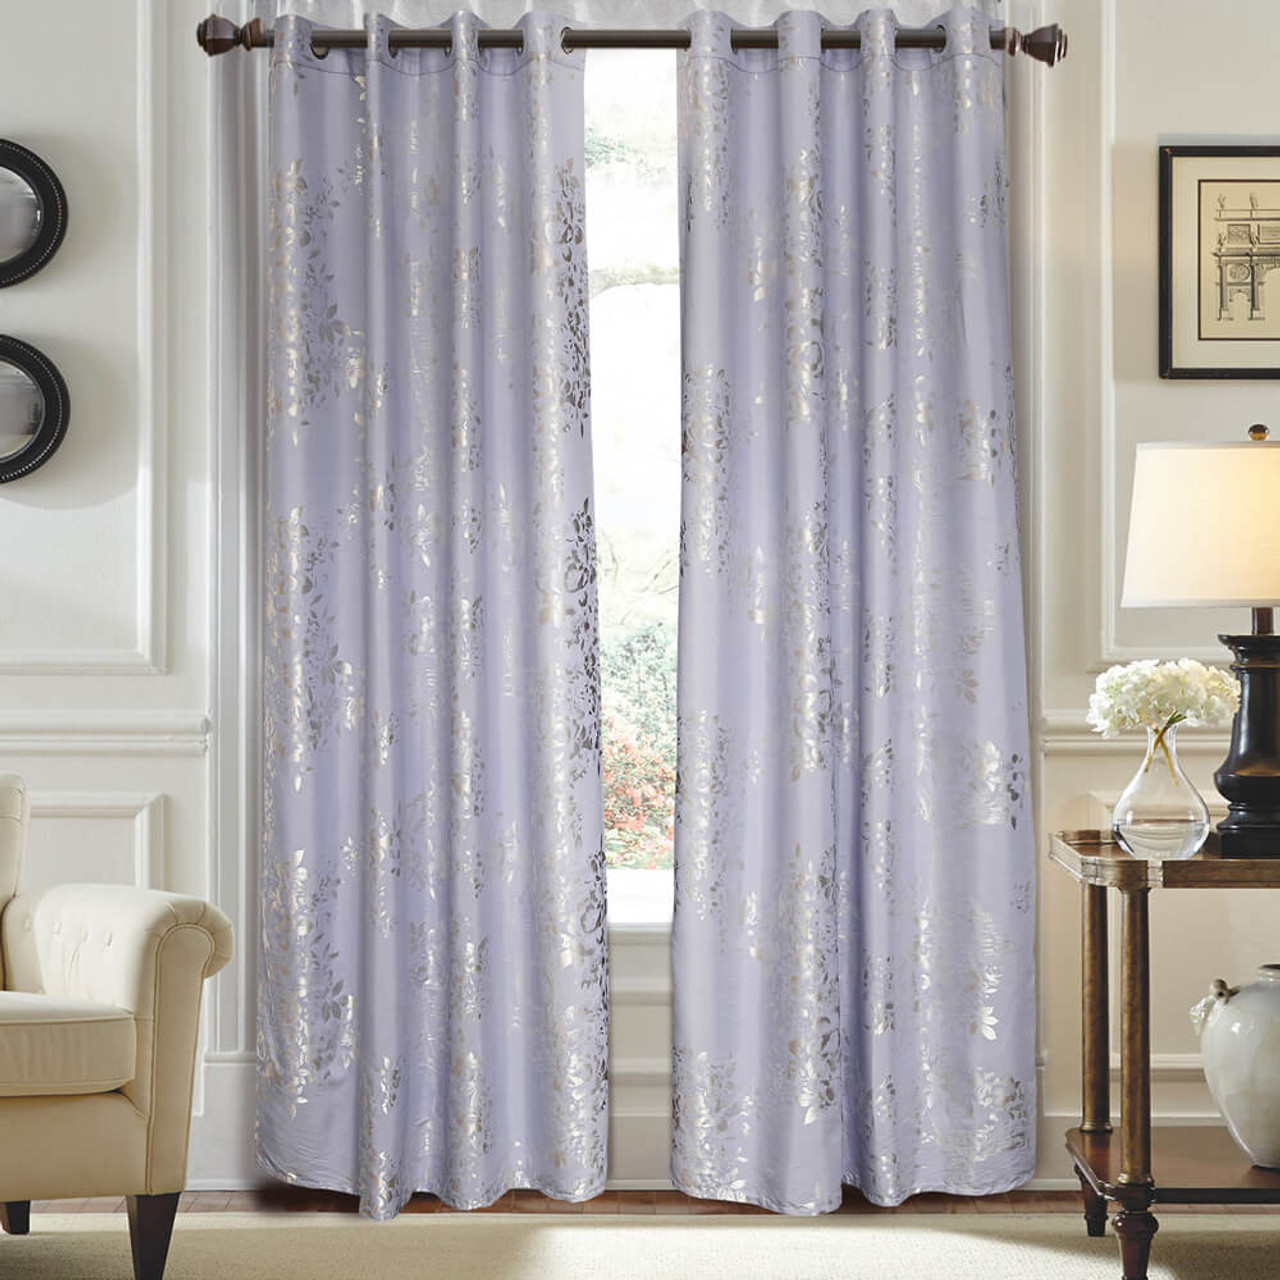 Curtain Panel Semi-Blackout Drapes, DMC720 Dolce Mela Munich Window Treatments